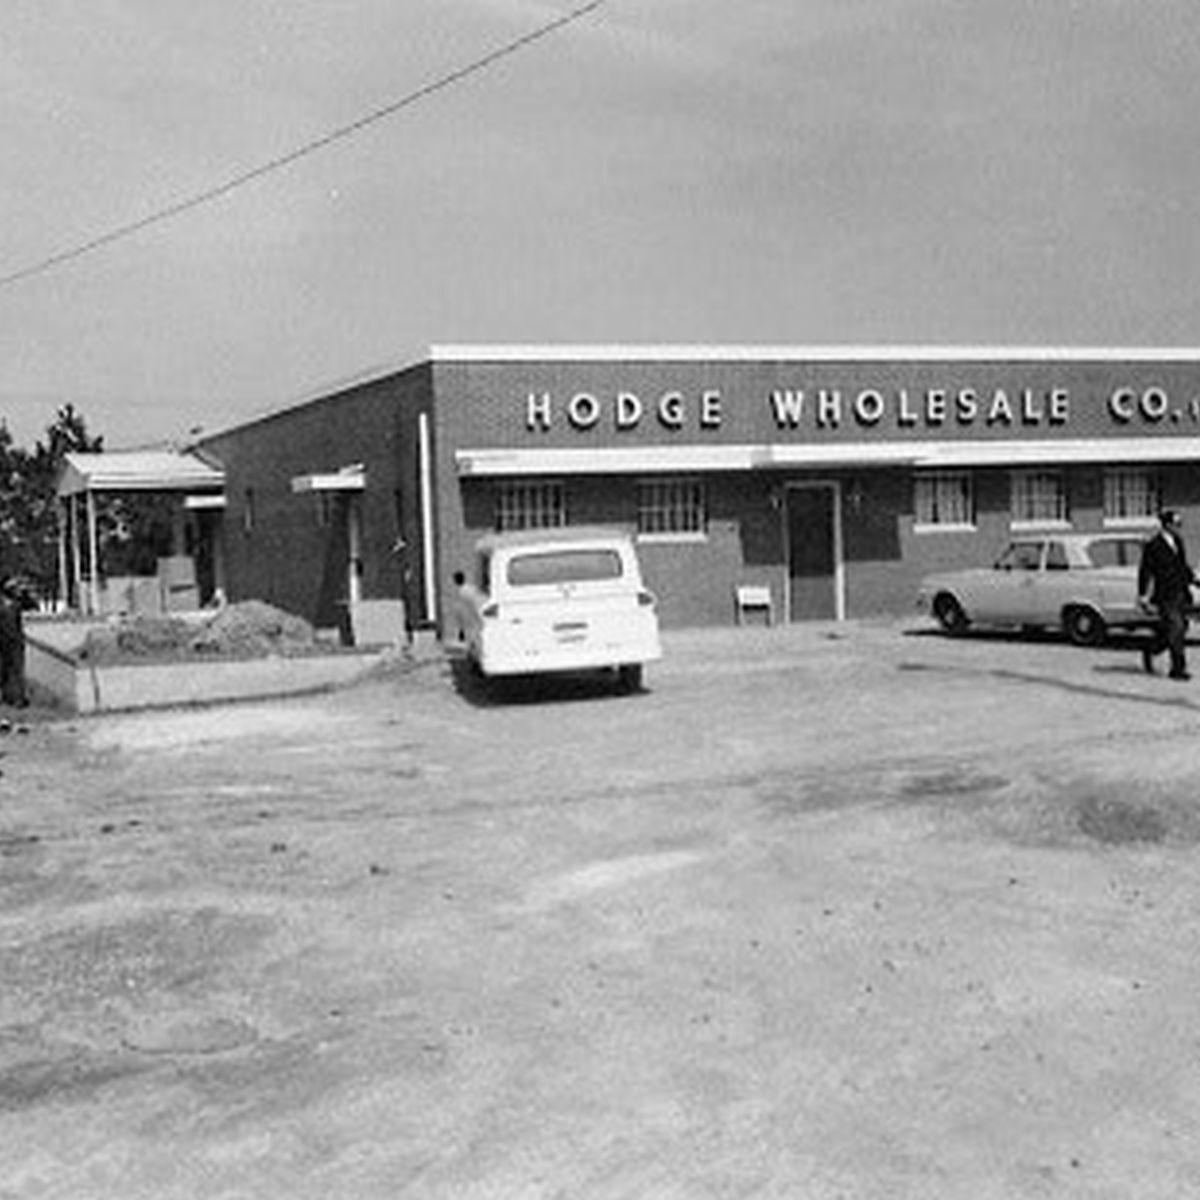 Hodge Floors: The Early Days